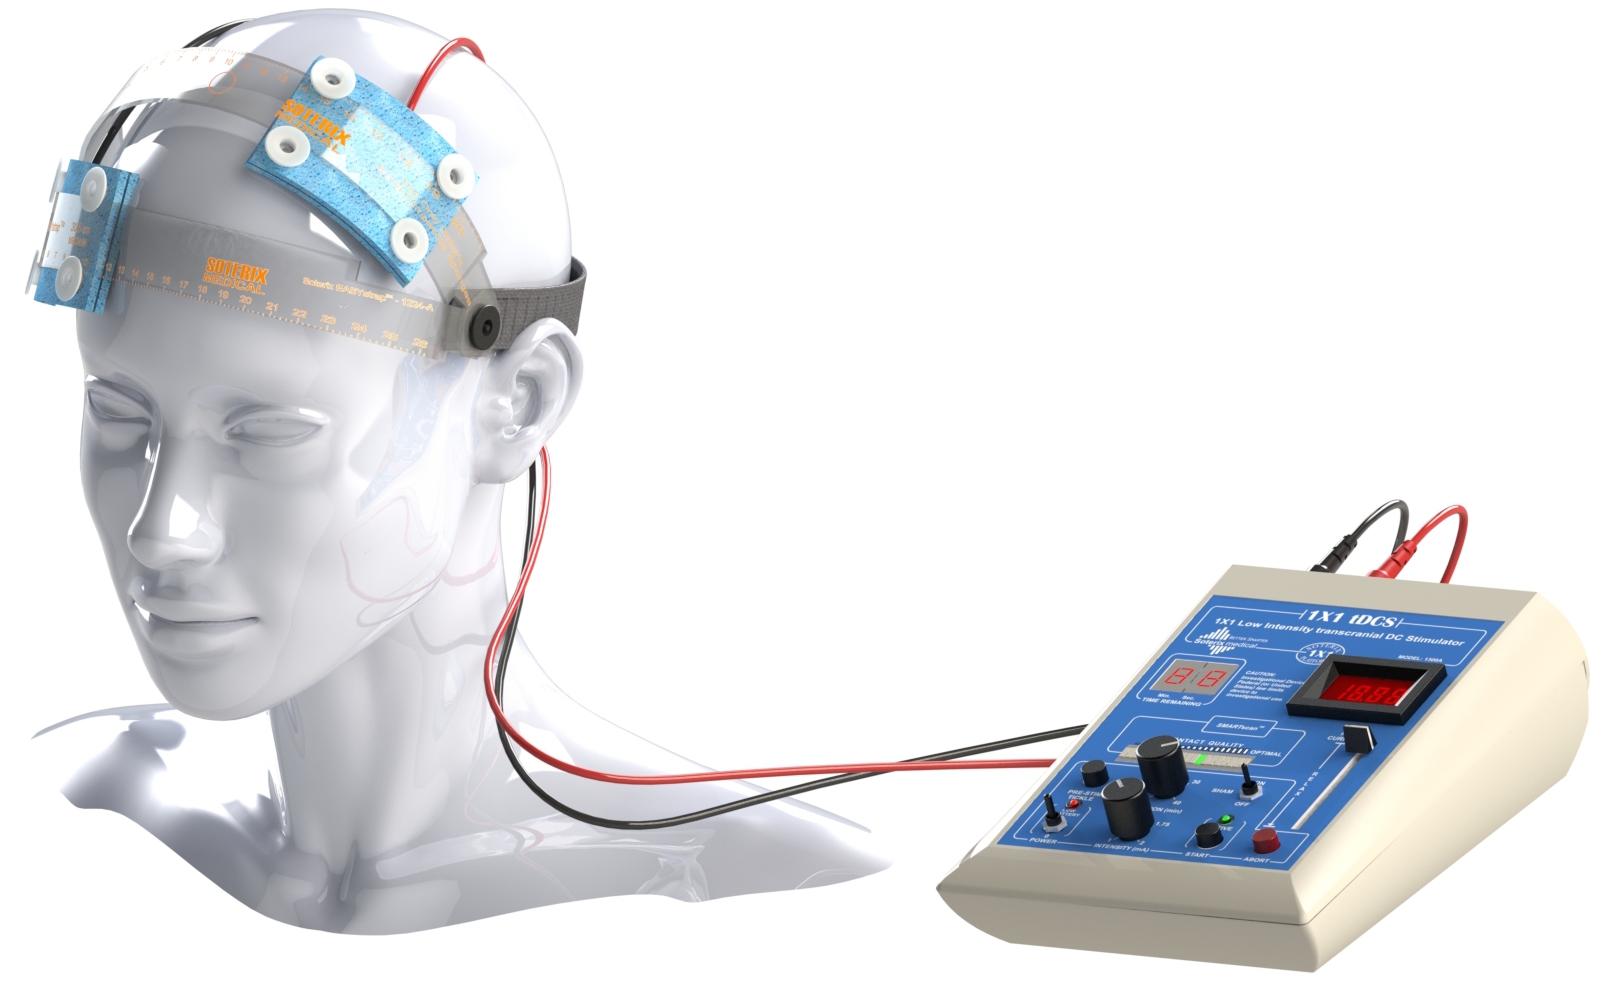 Soterix Medical 1x1 tDCS Device and EASYstrap